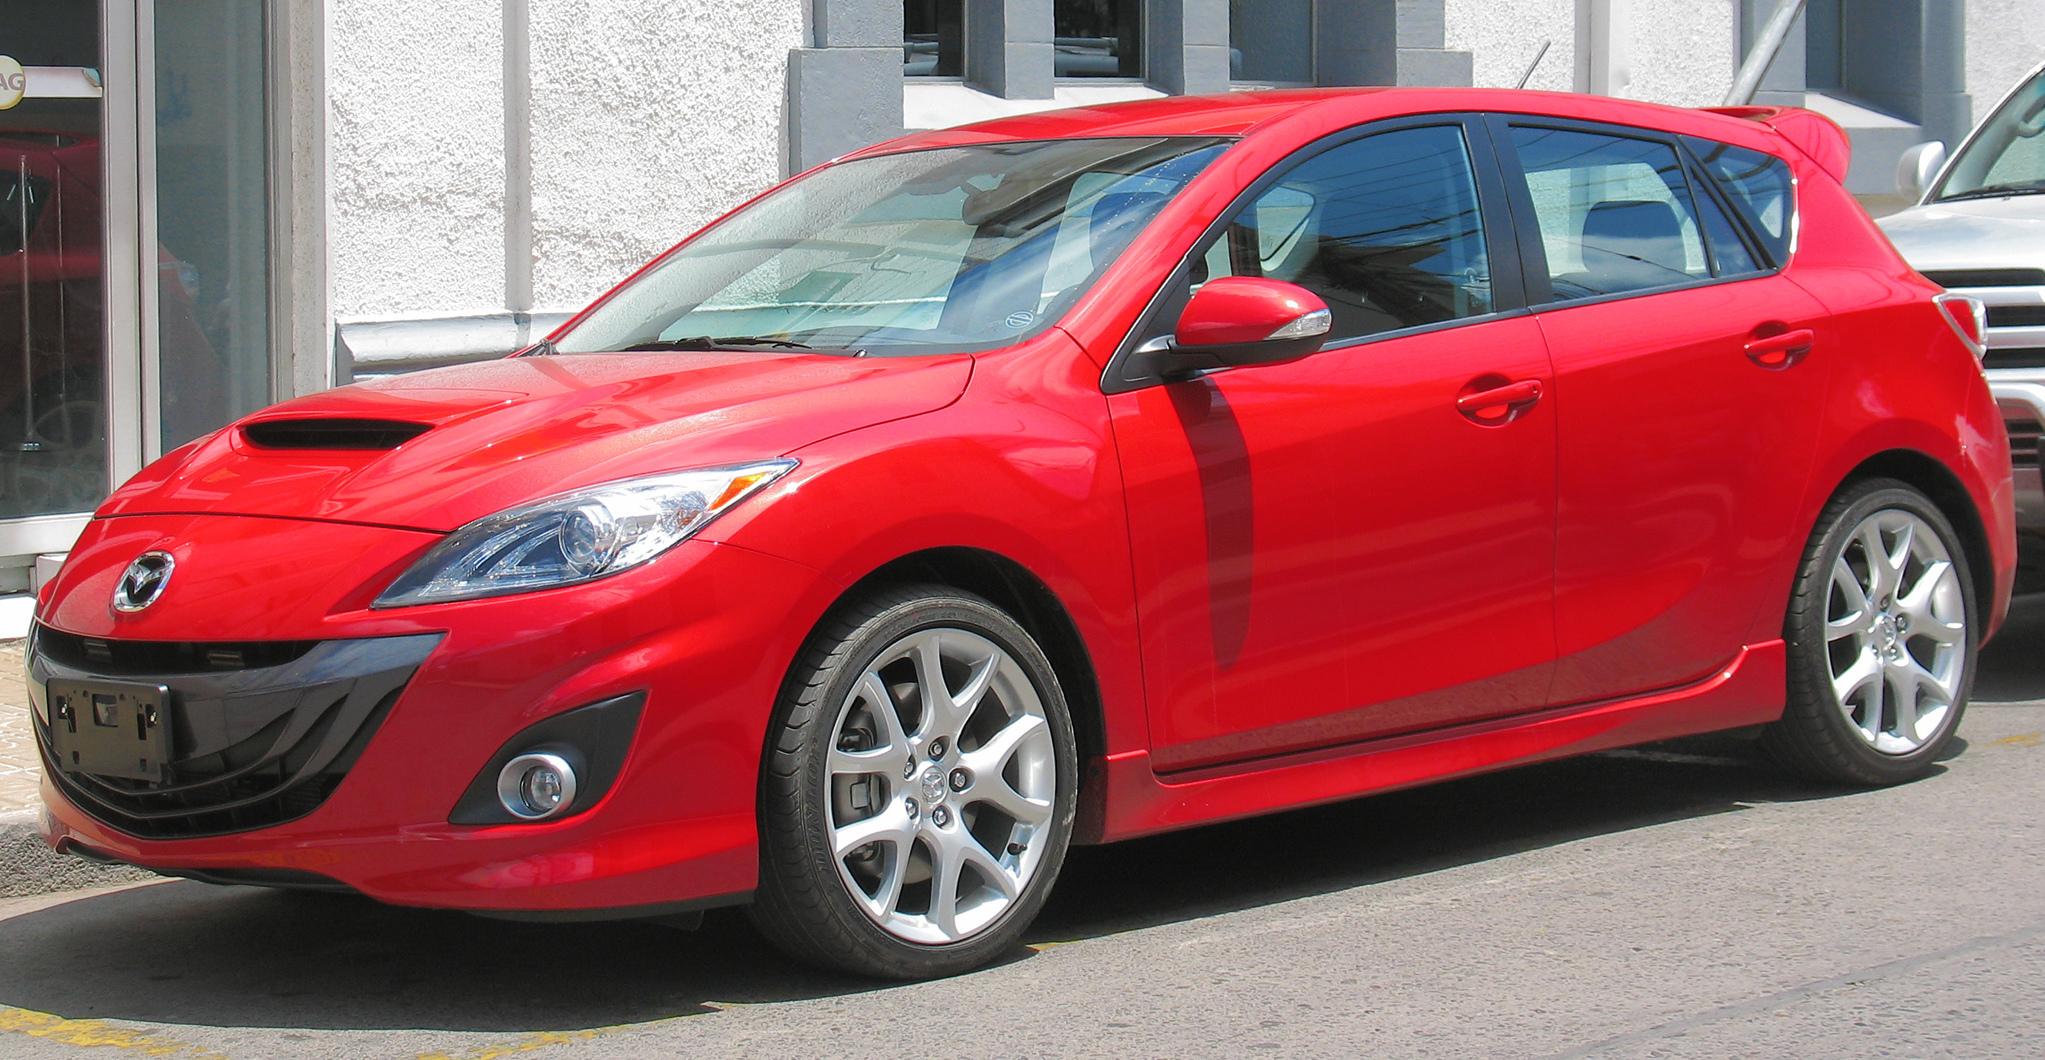 Kekurangan Mazda 3 2011 Harga